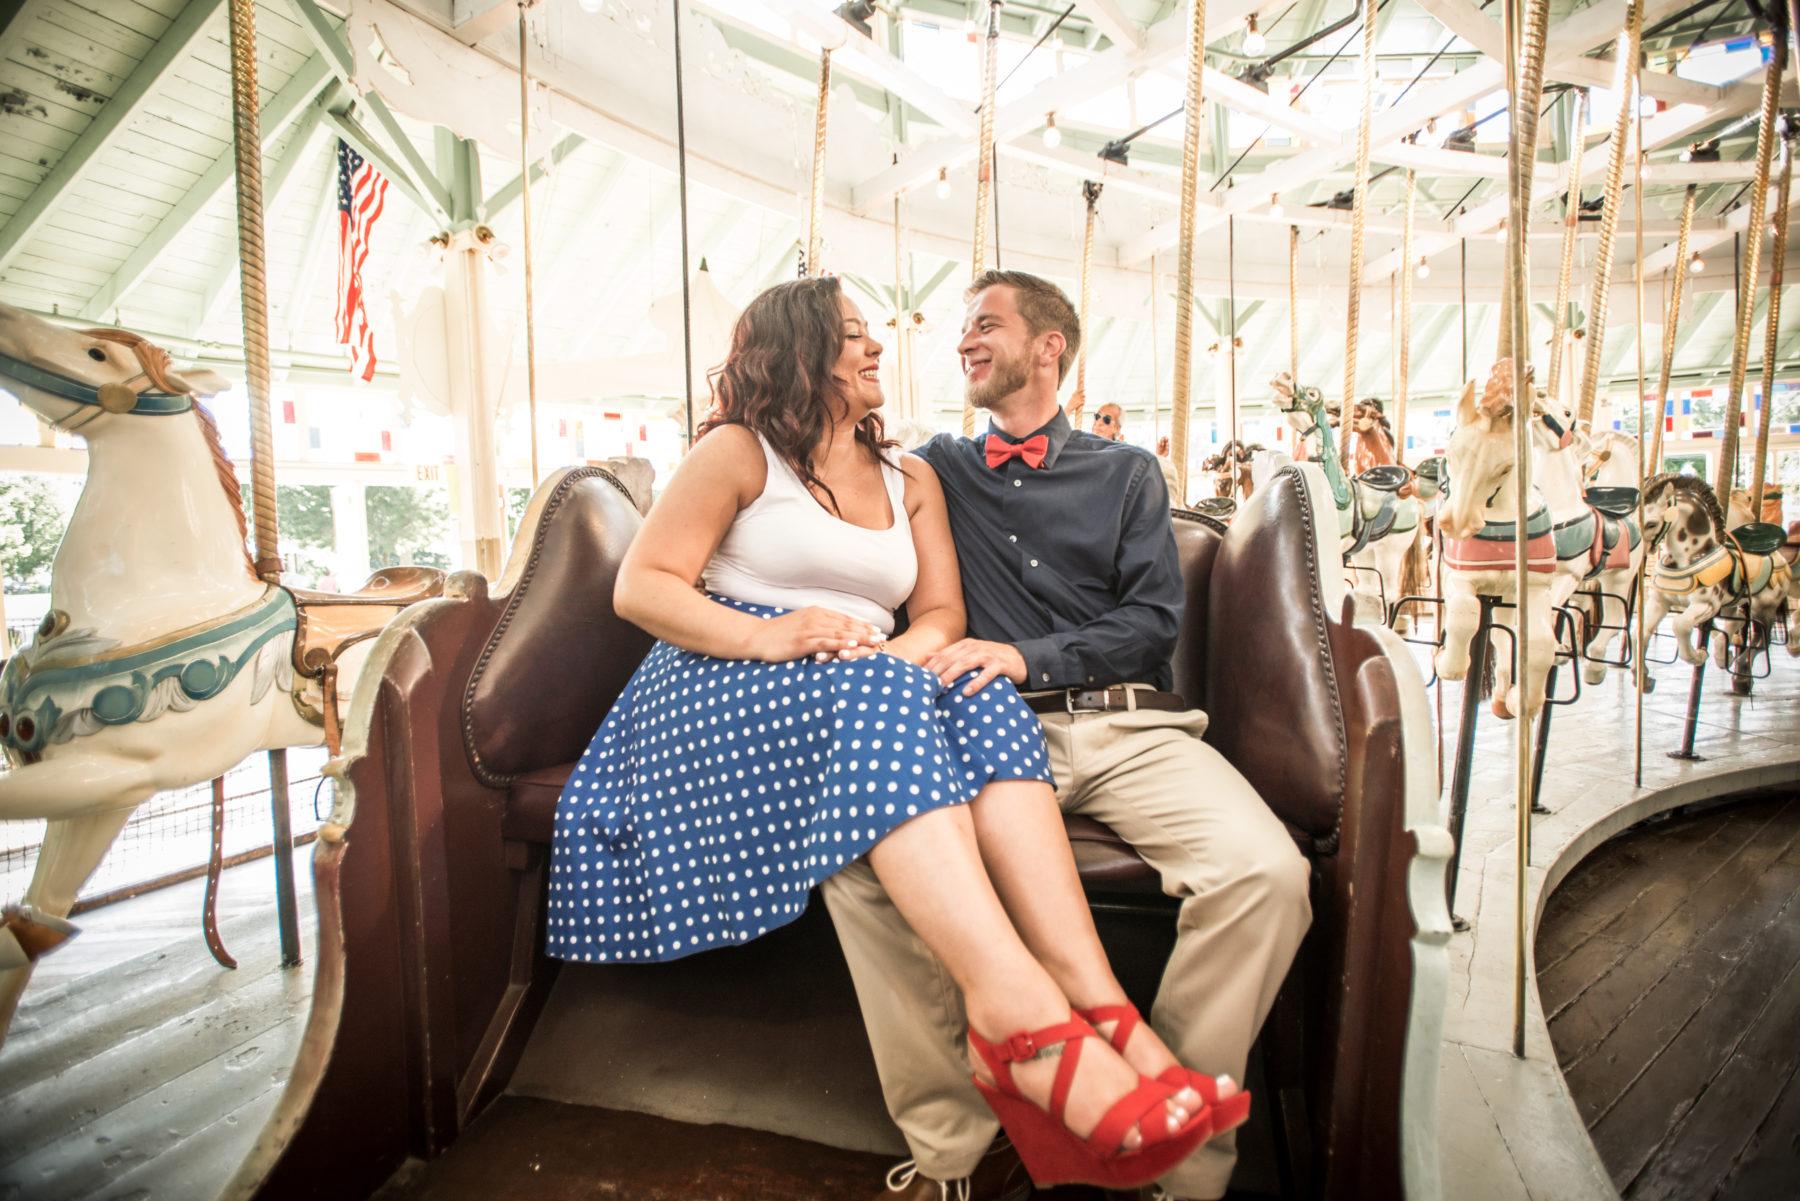 Michaela and PJ   Louff Carousel RIverside Engagement Photos   Blueflash Photography